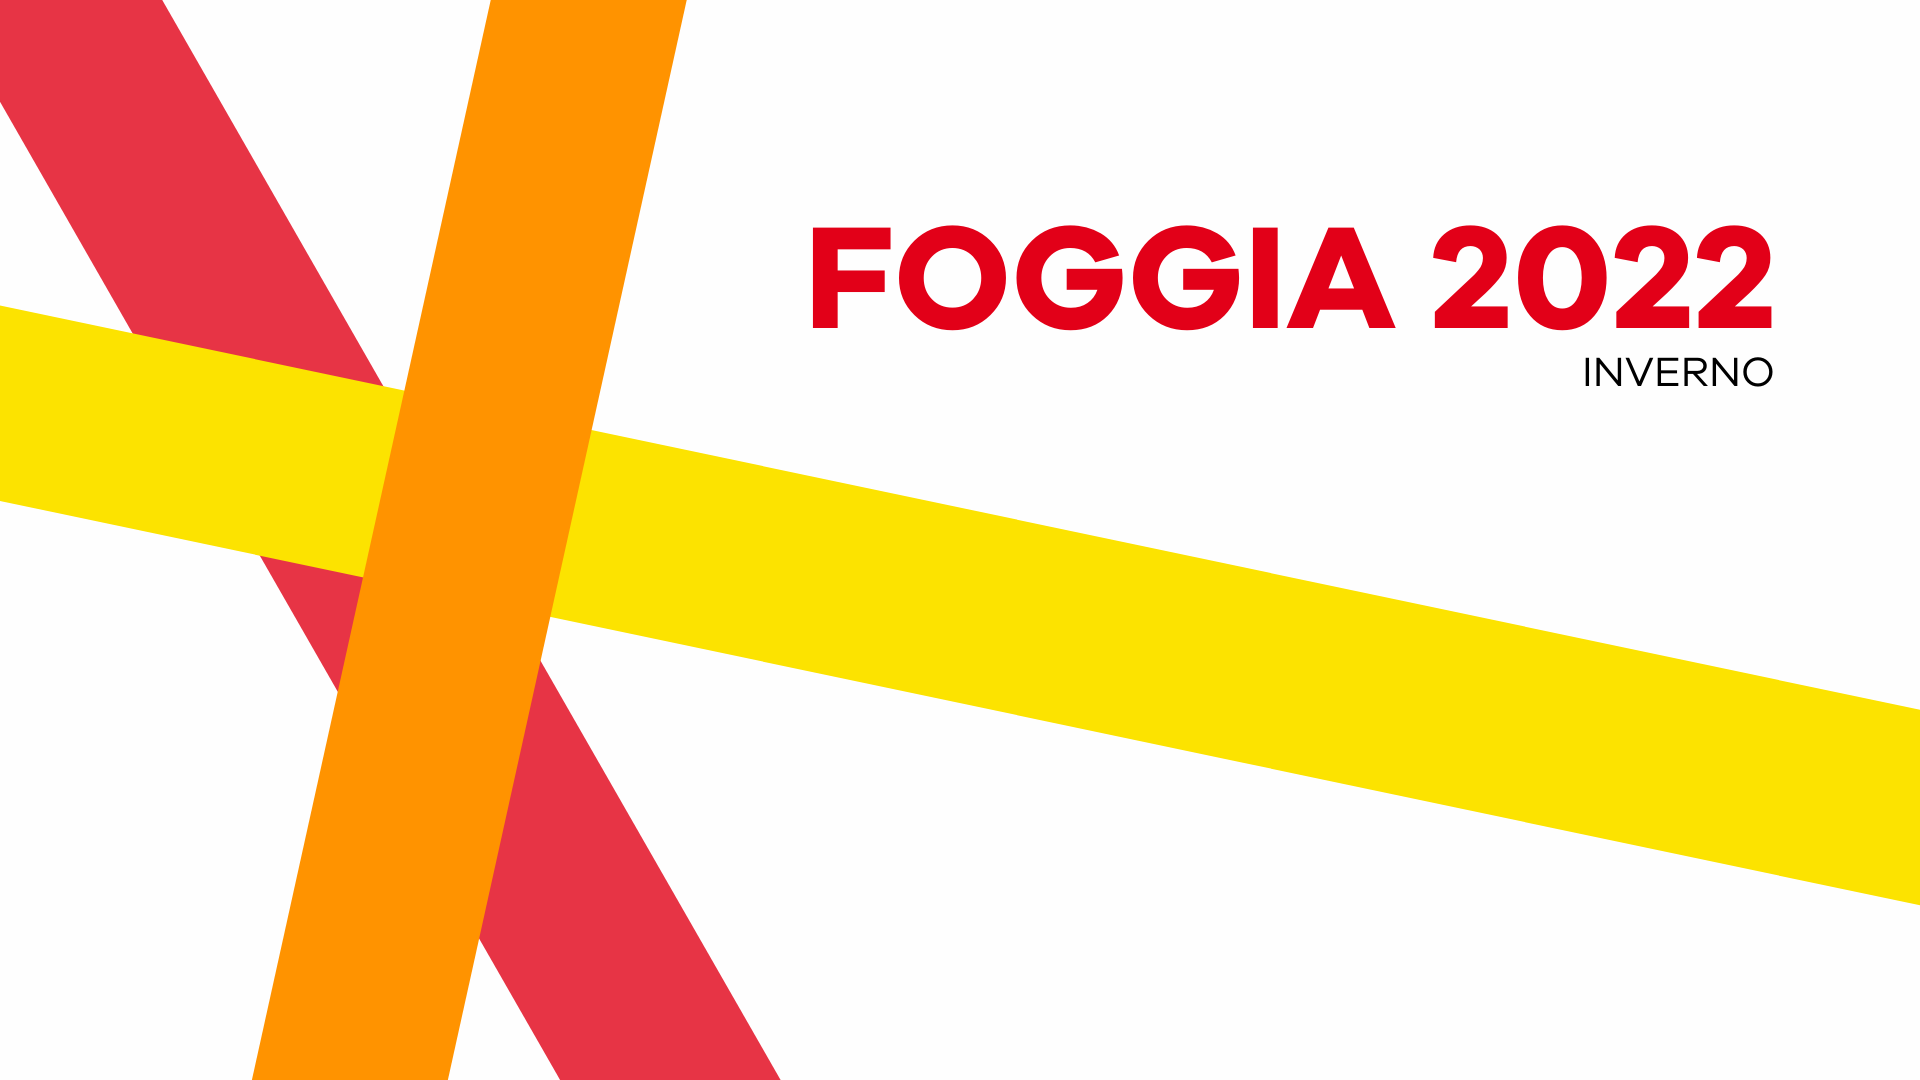 Foggia 2022 Online